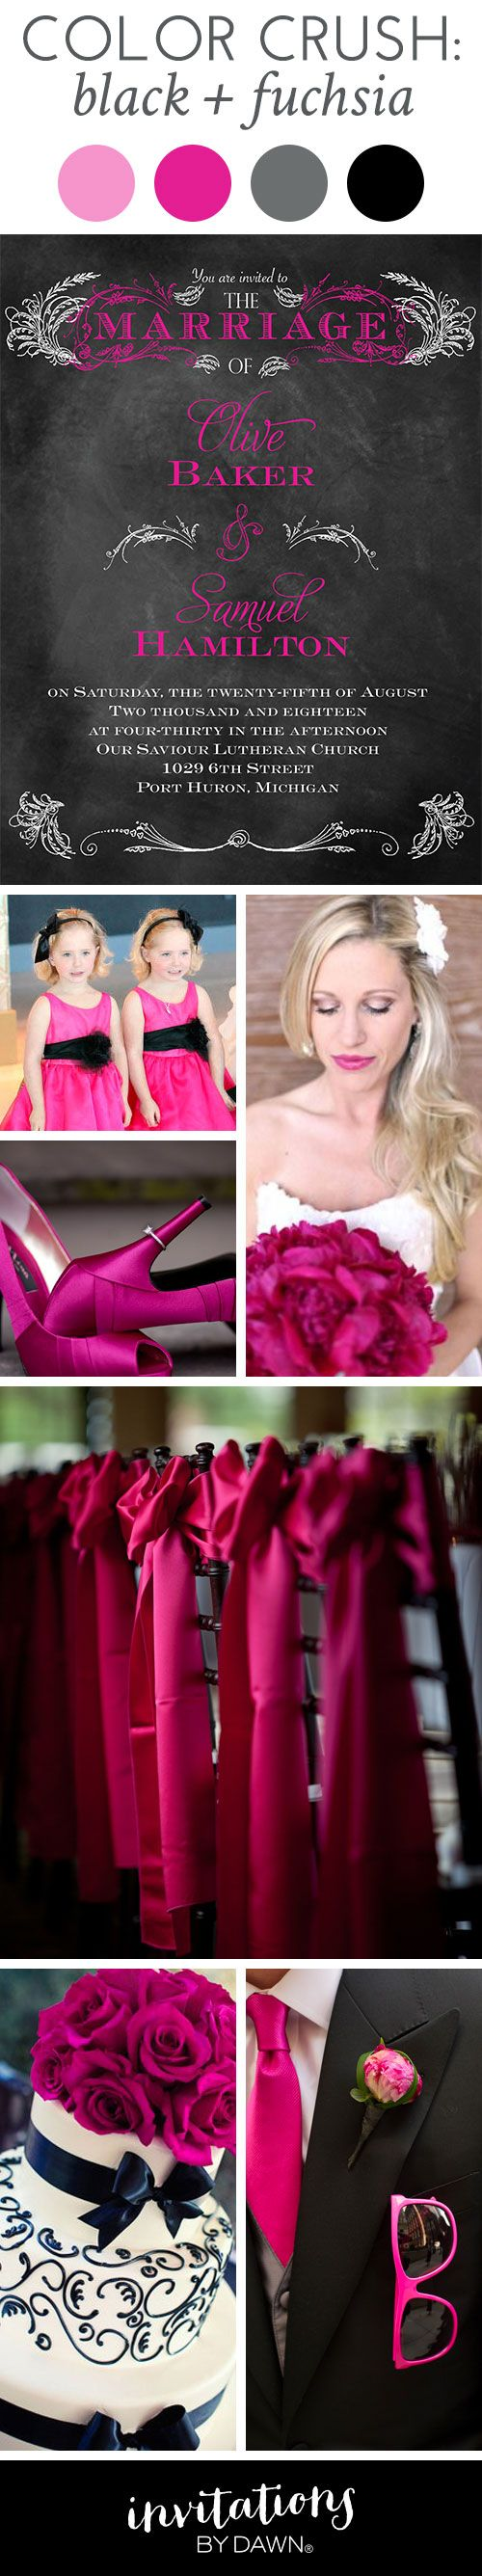 Color Crush: Black and Fuchsia #weddingcolors